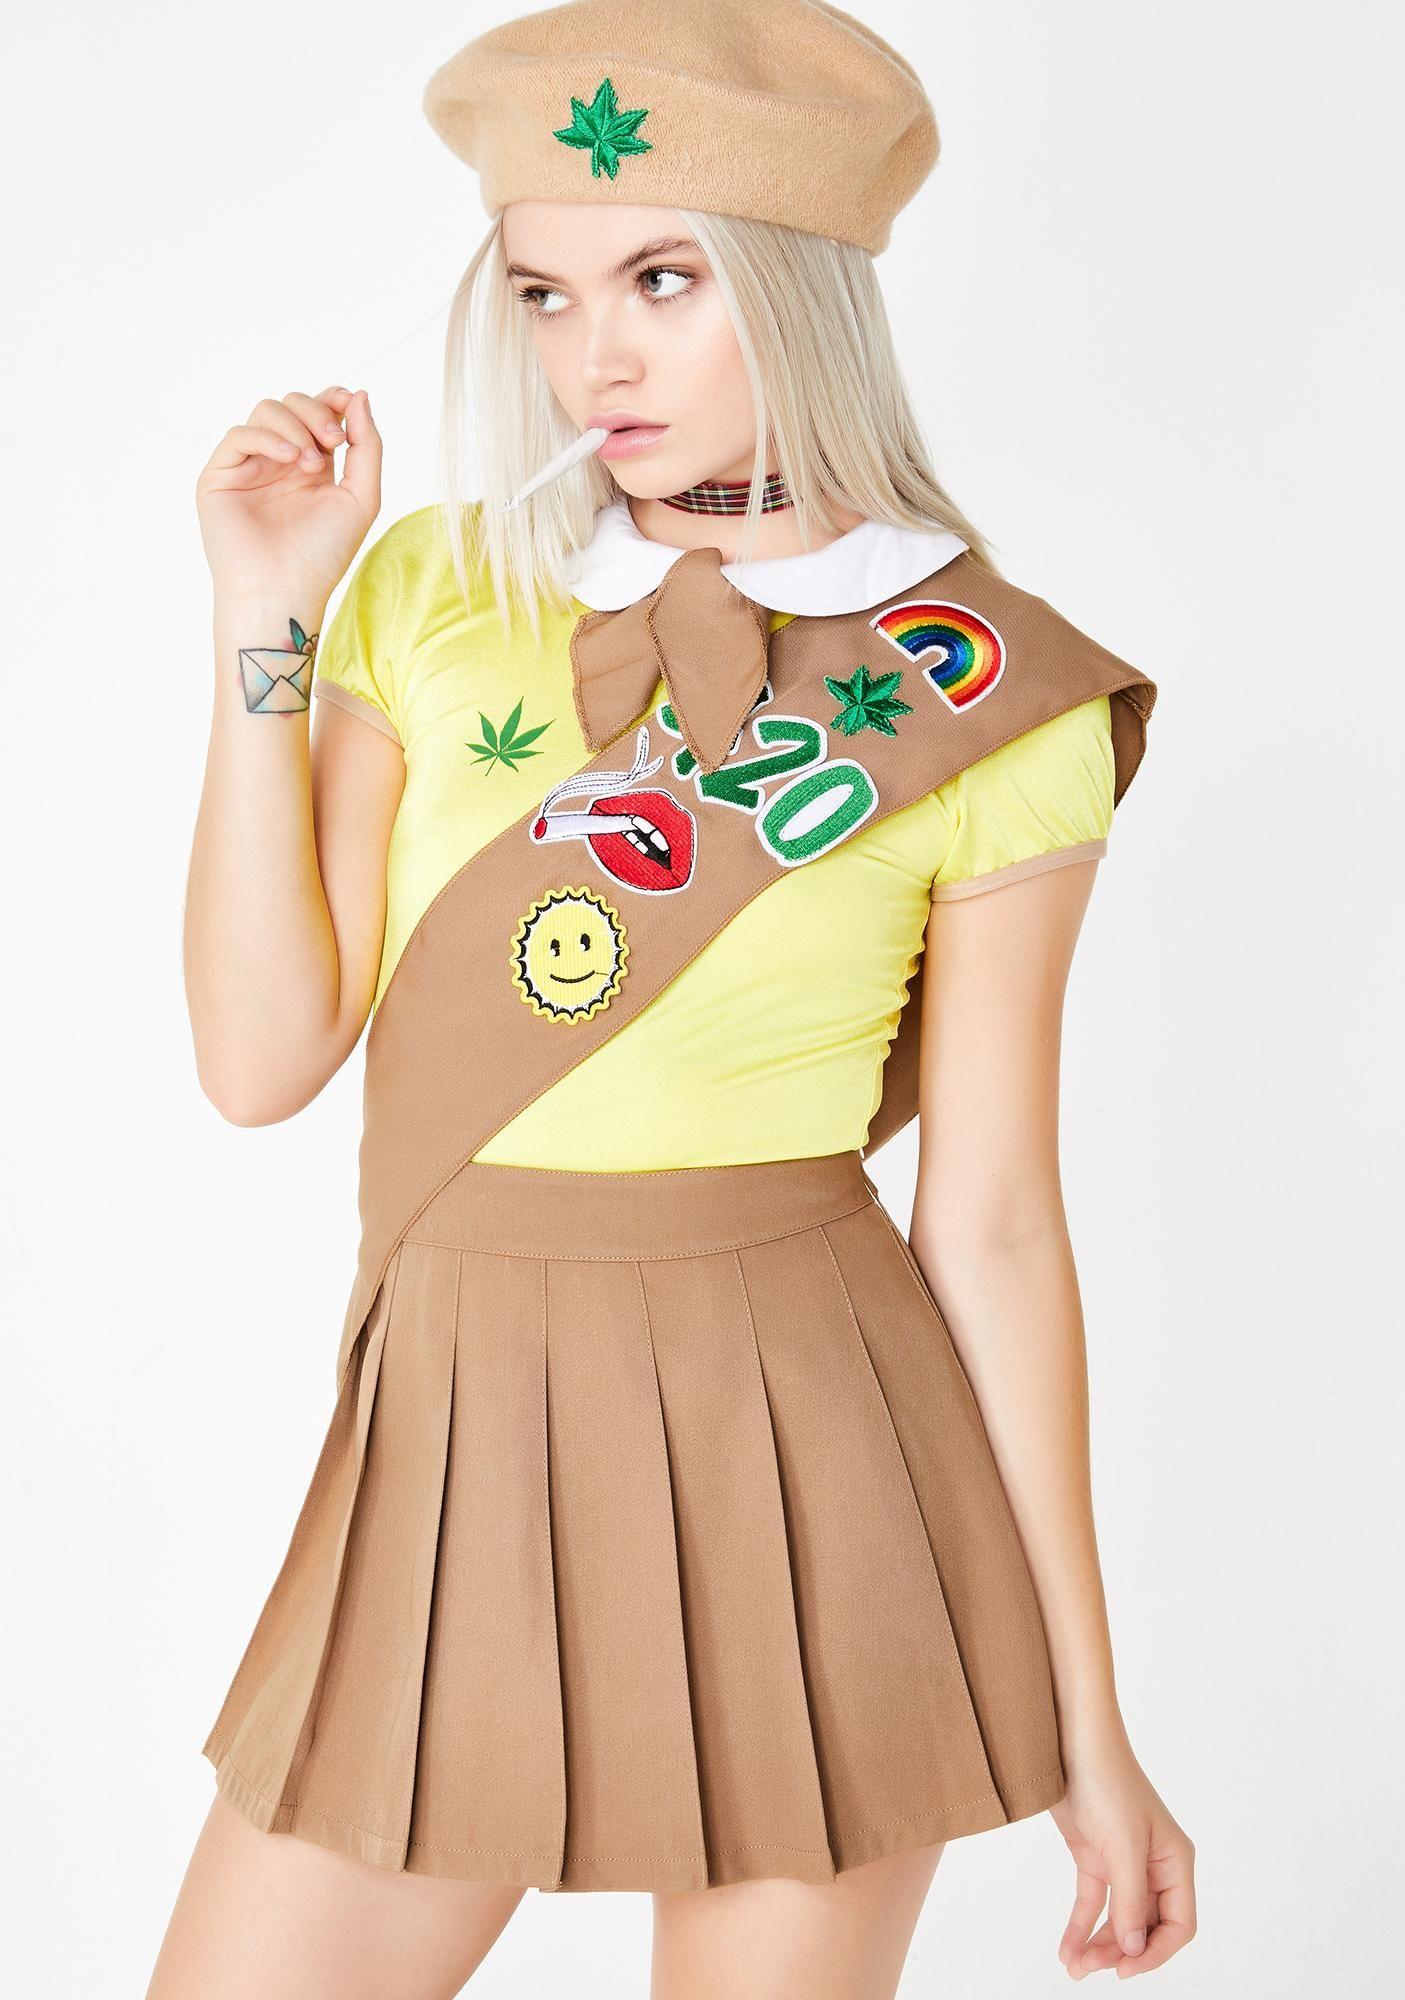 Dress up sexy dolls online photo 591